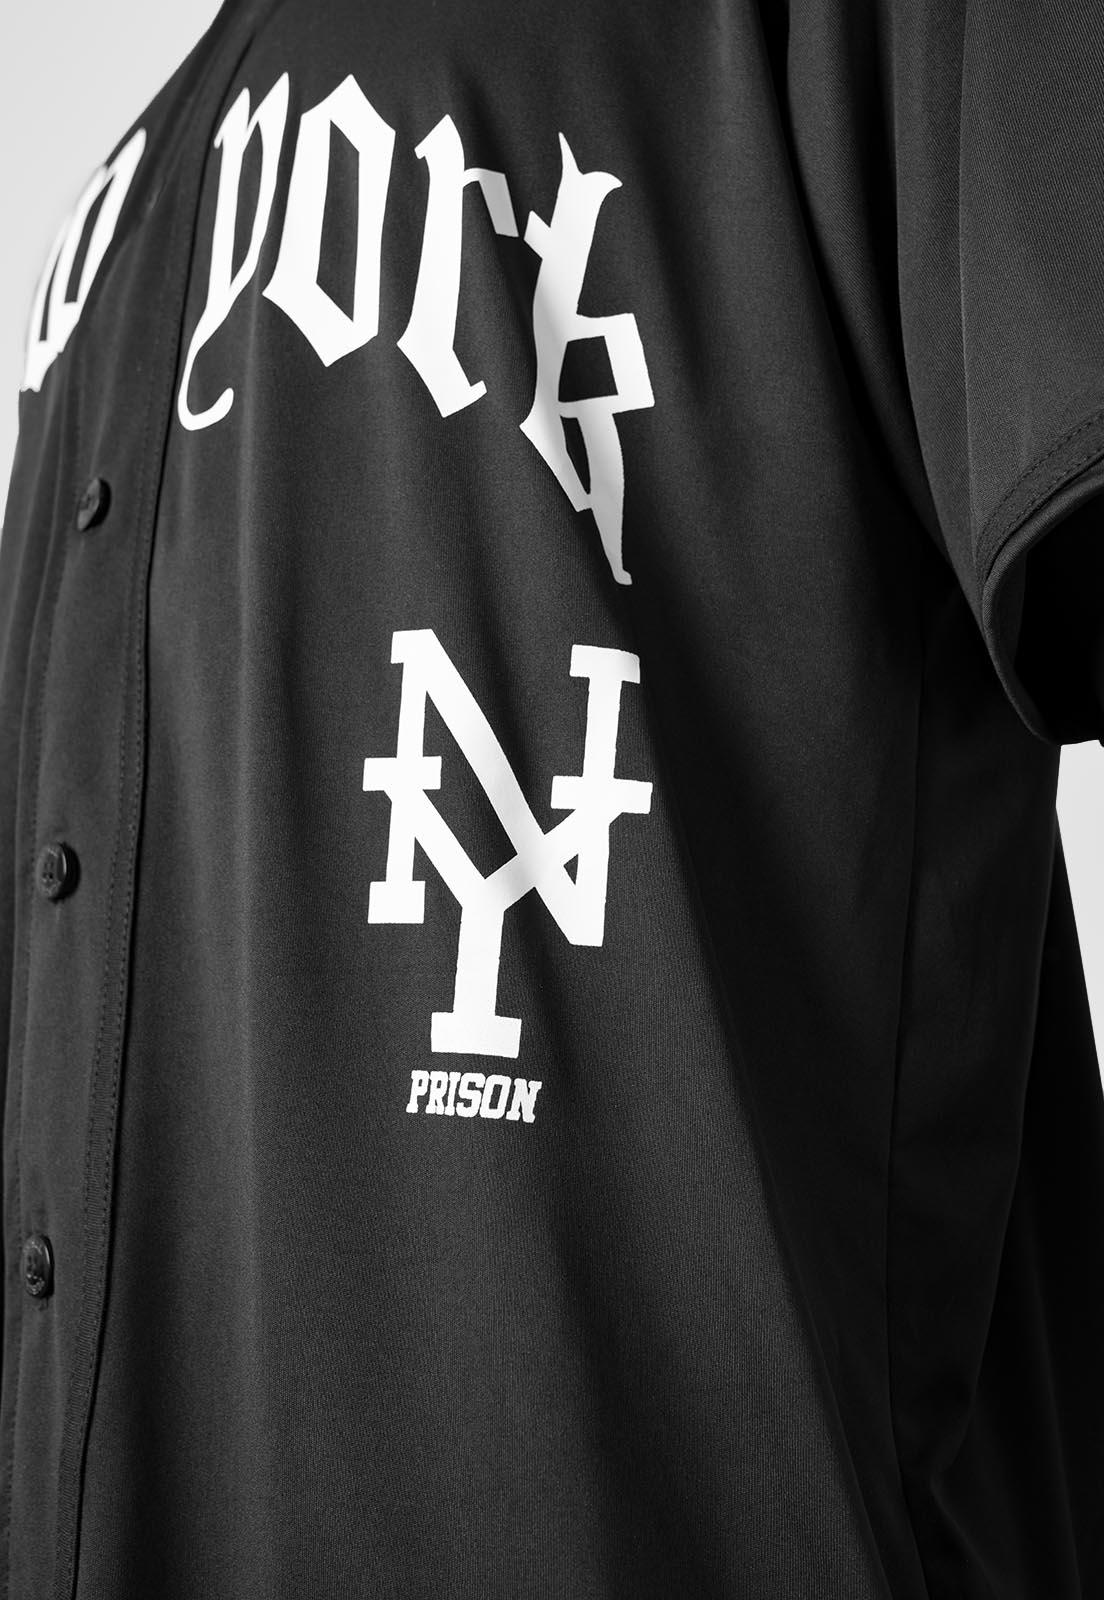 Camisa Baseball New York Prison Preta